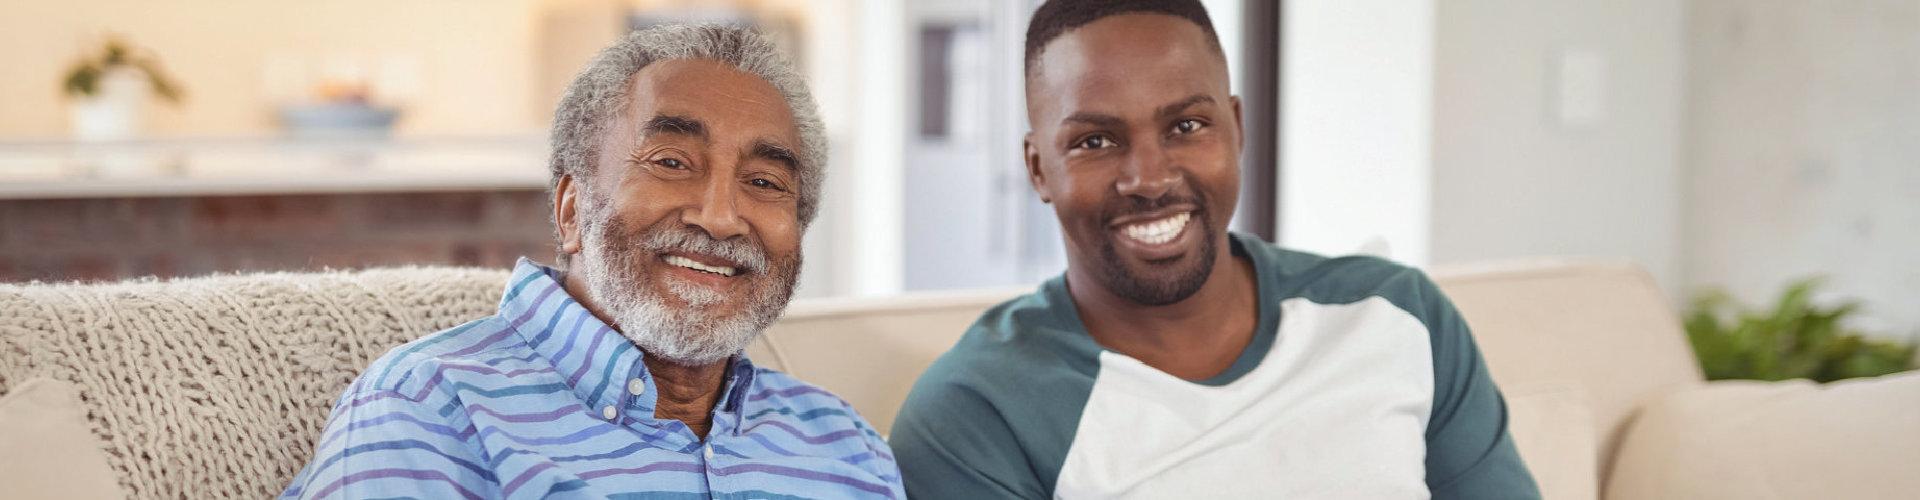 adult man and senior man smiling